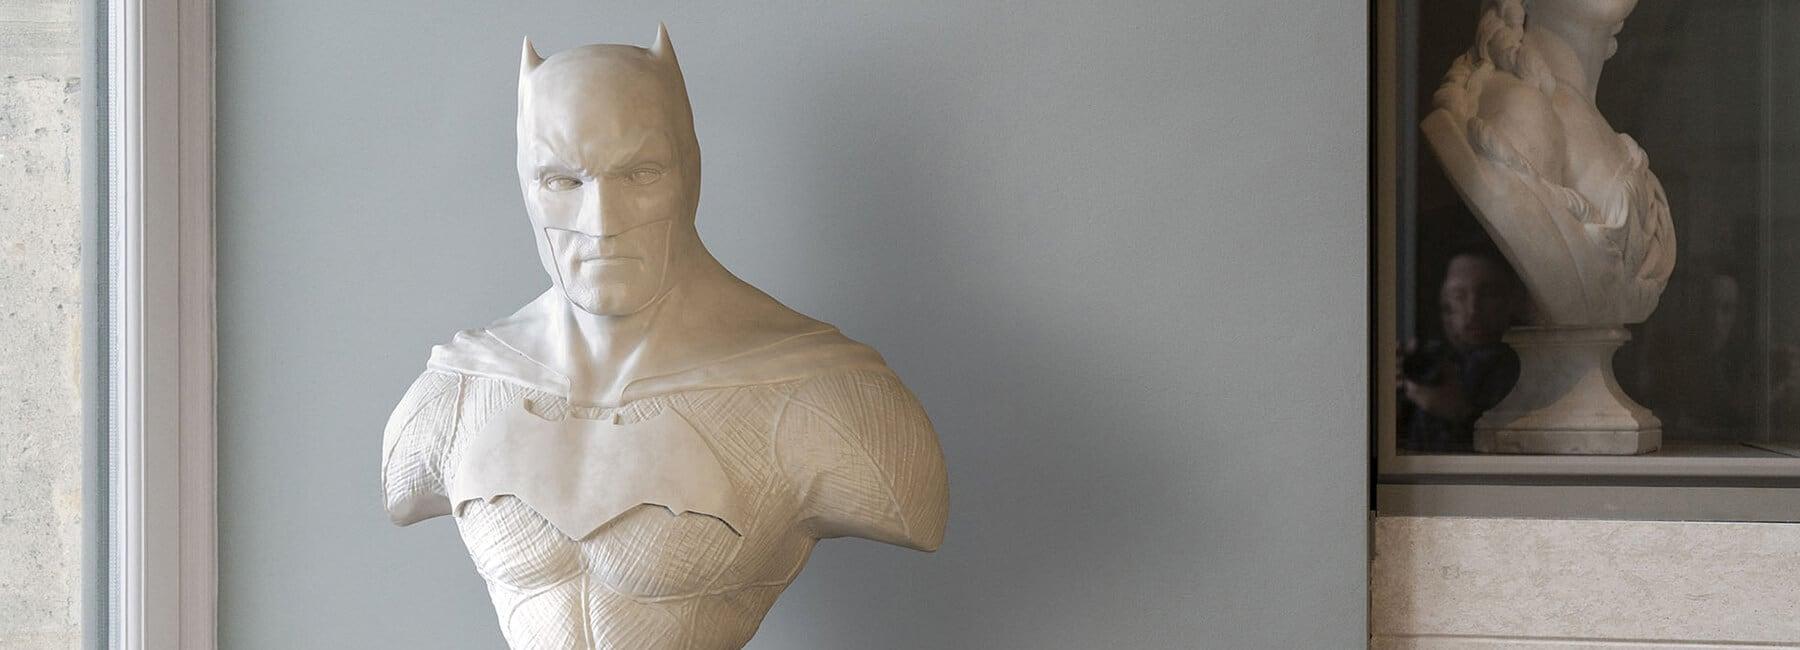 eo caillard stone super heroes fy 1